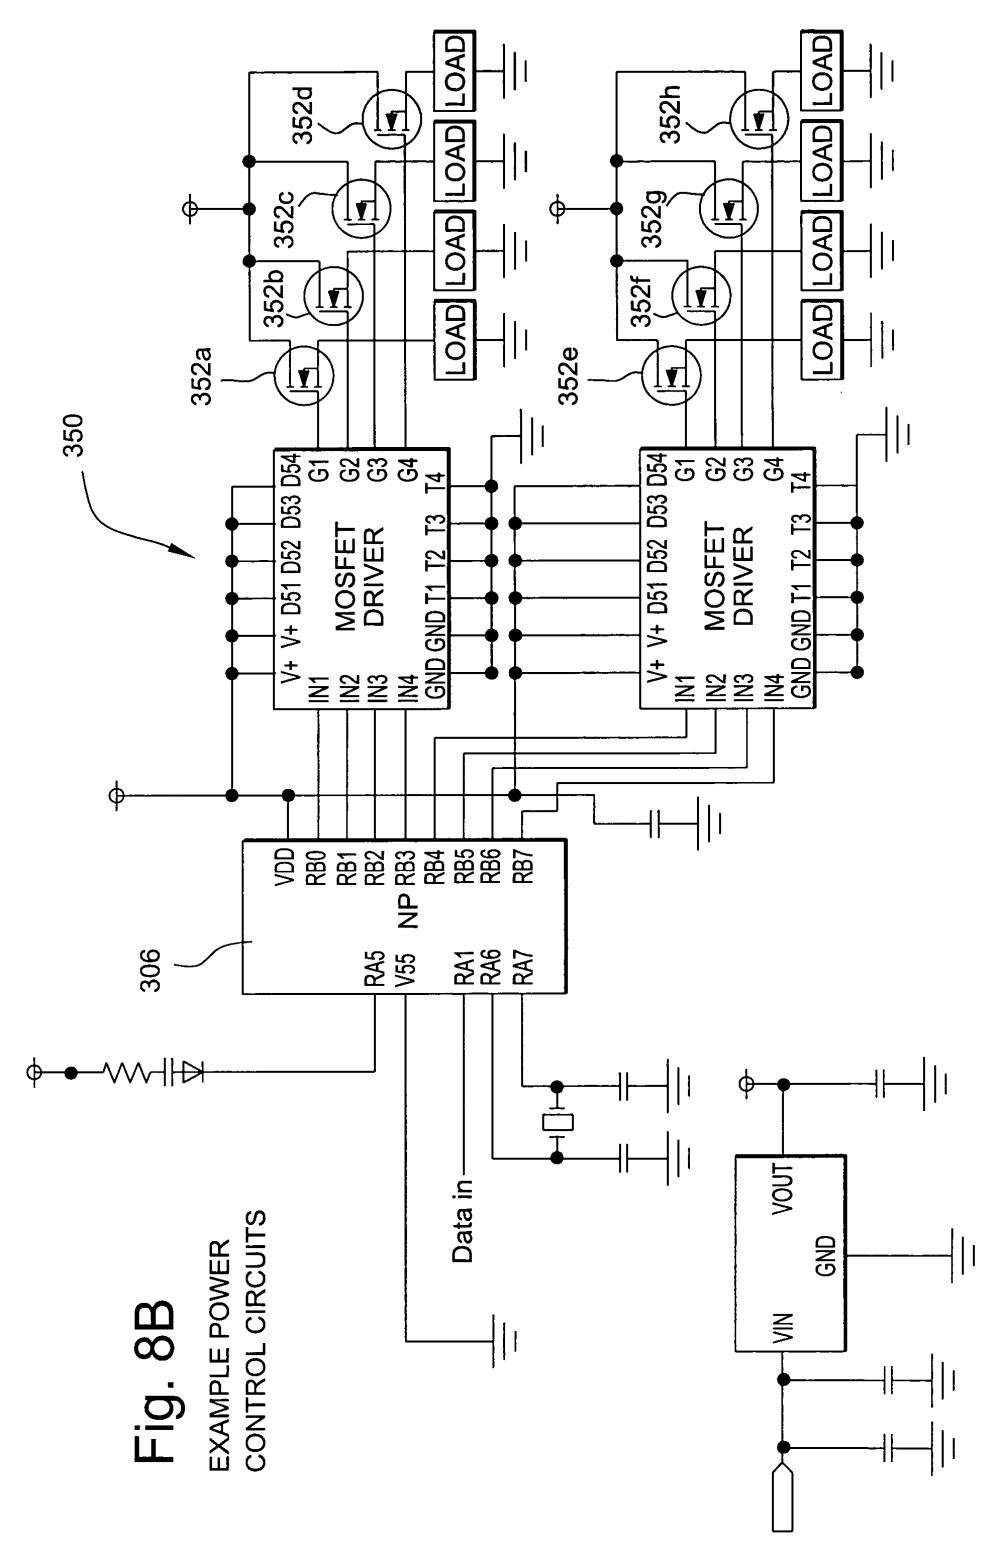 medium resolution of code 3 3672l4 wiring diagram easy wiring diagrams code 3 3672l4 wiring diagram code circuit diagrams